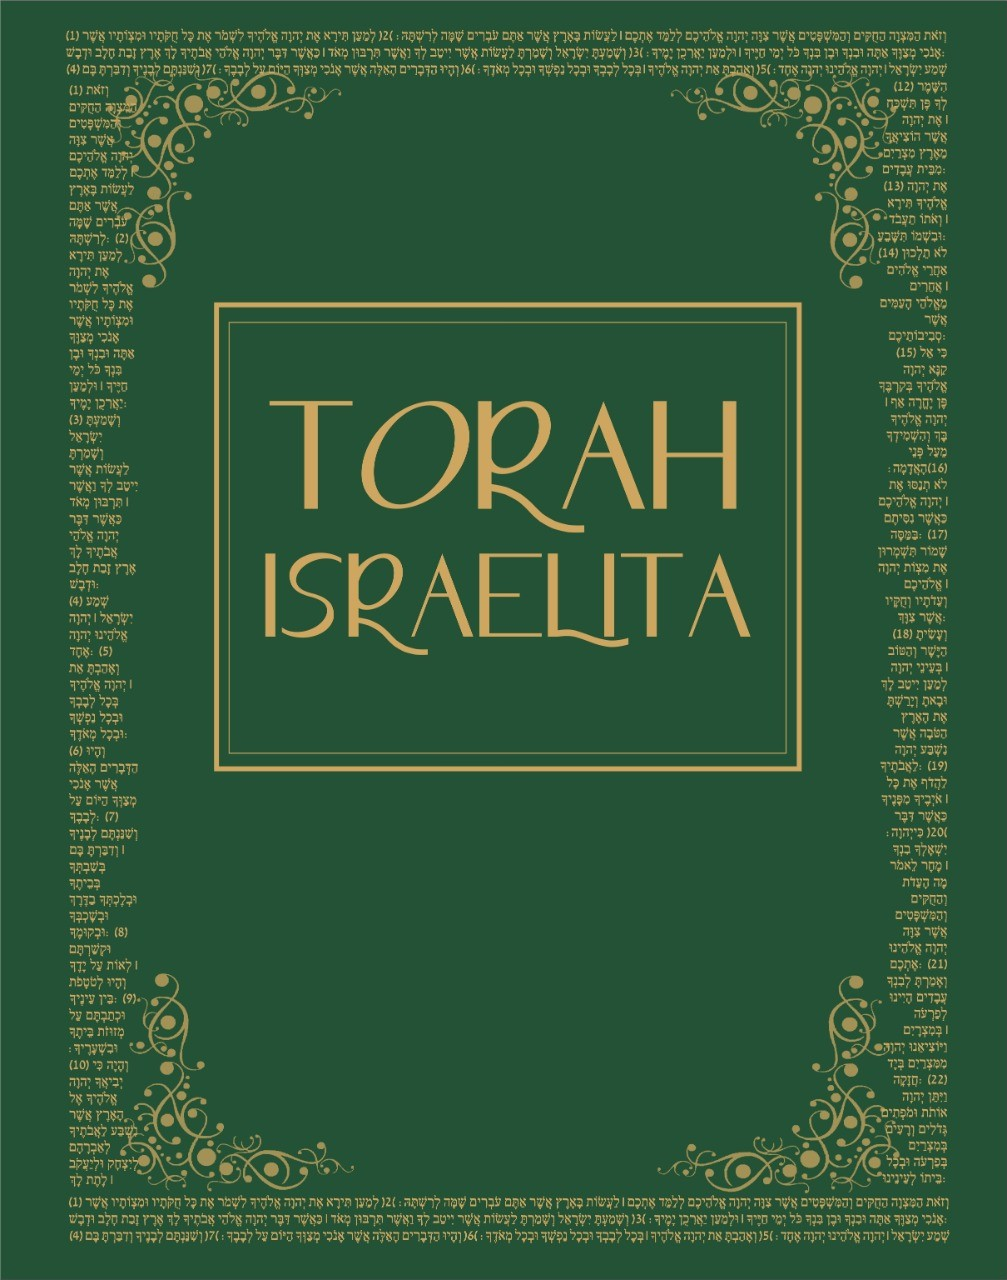 Torah Israelita